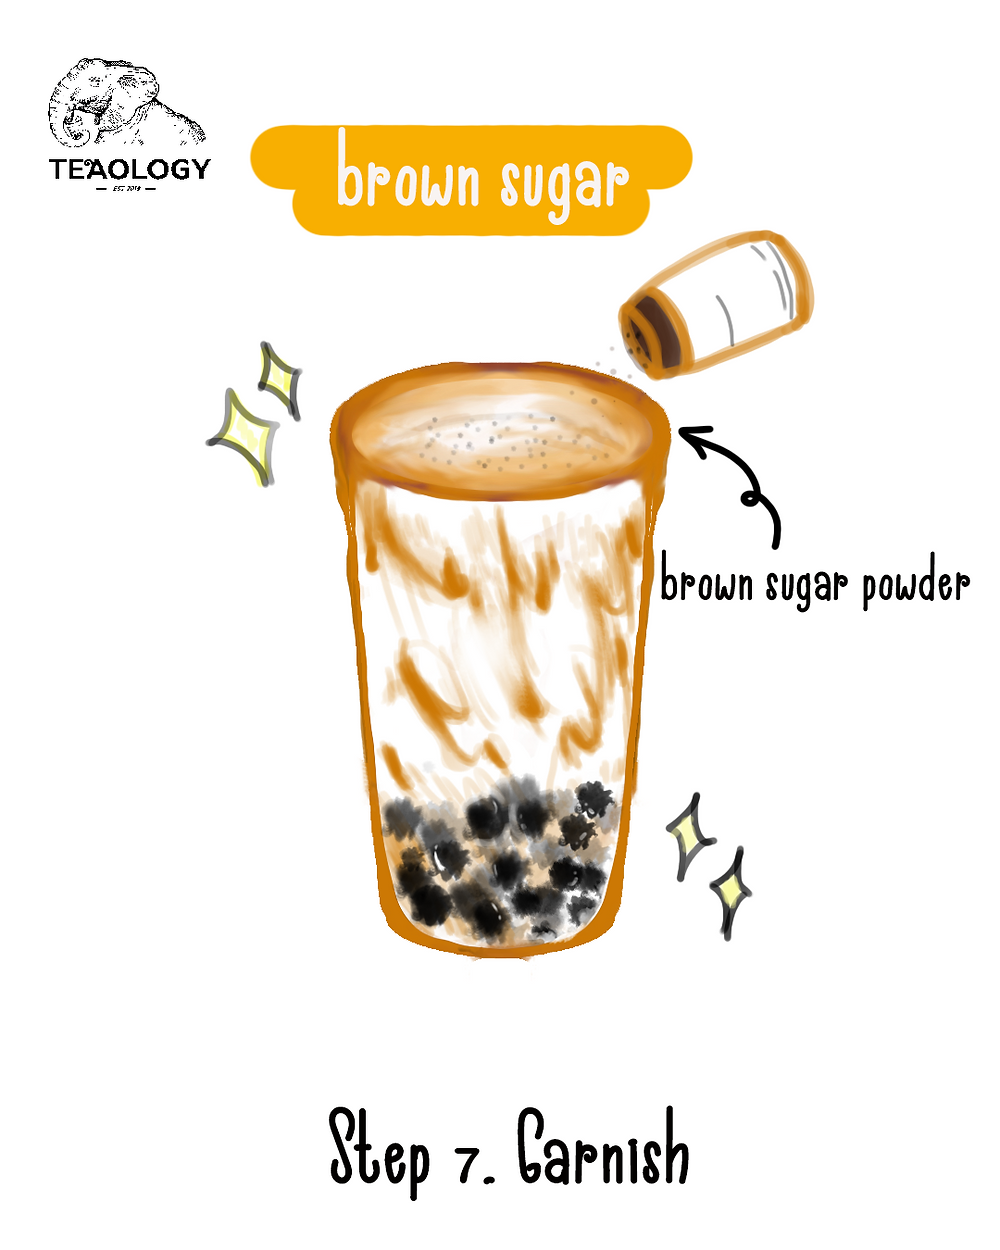 Step 7 to make brown sugar boba - Garnish brown sugar boba